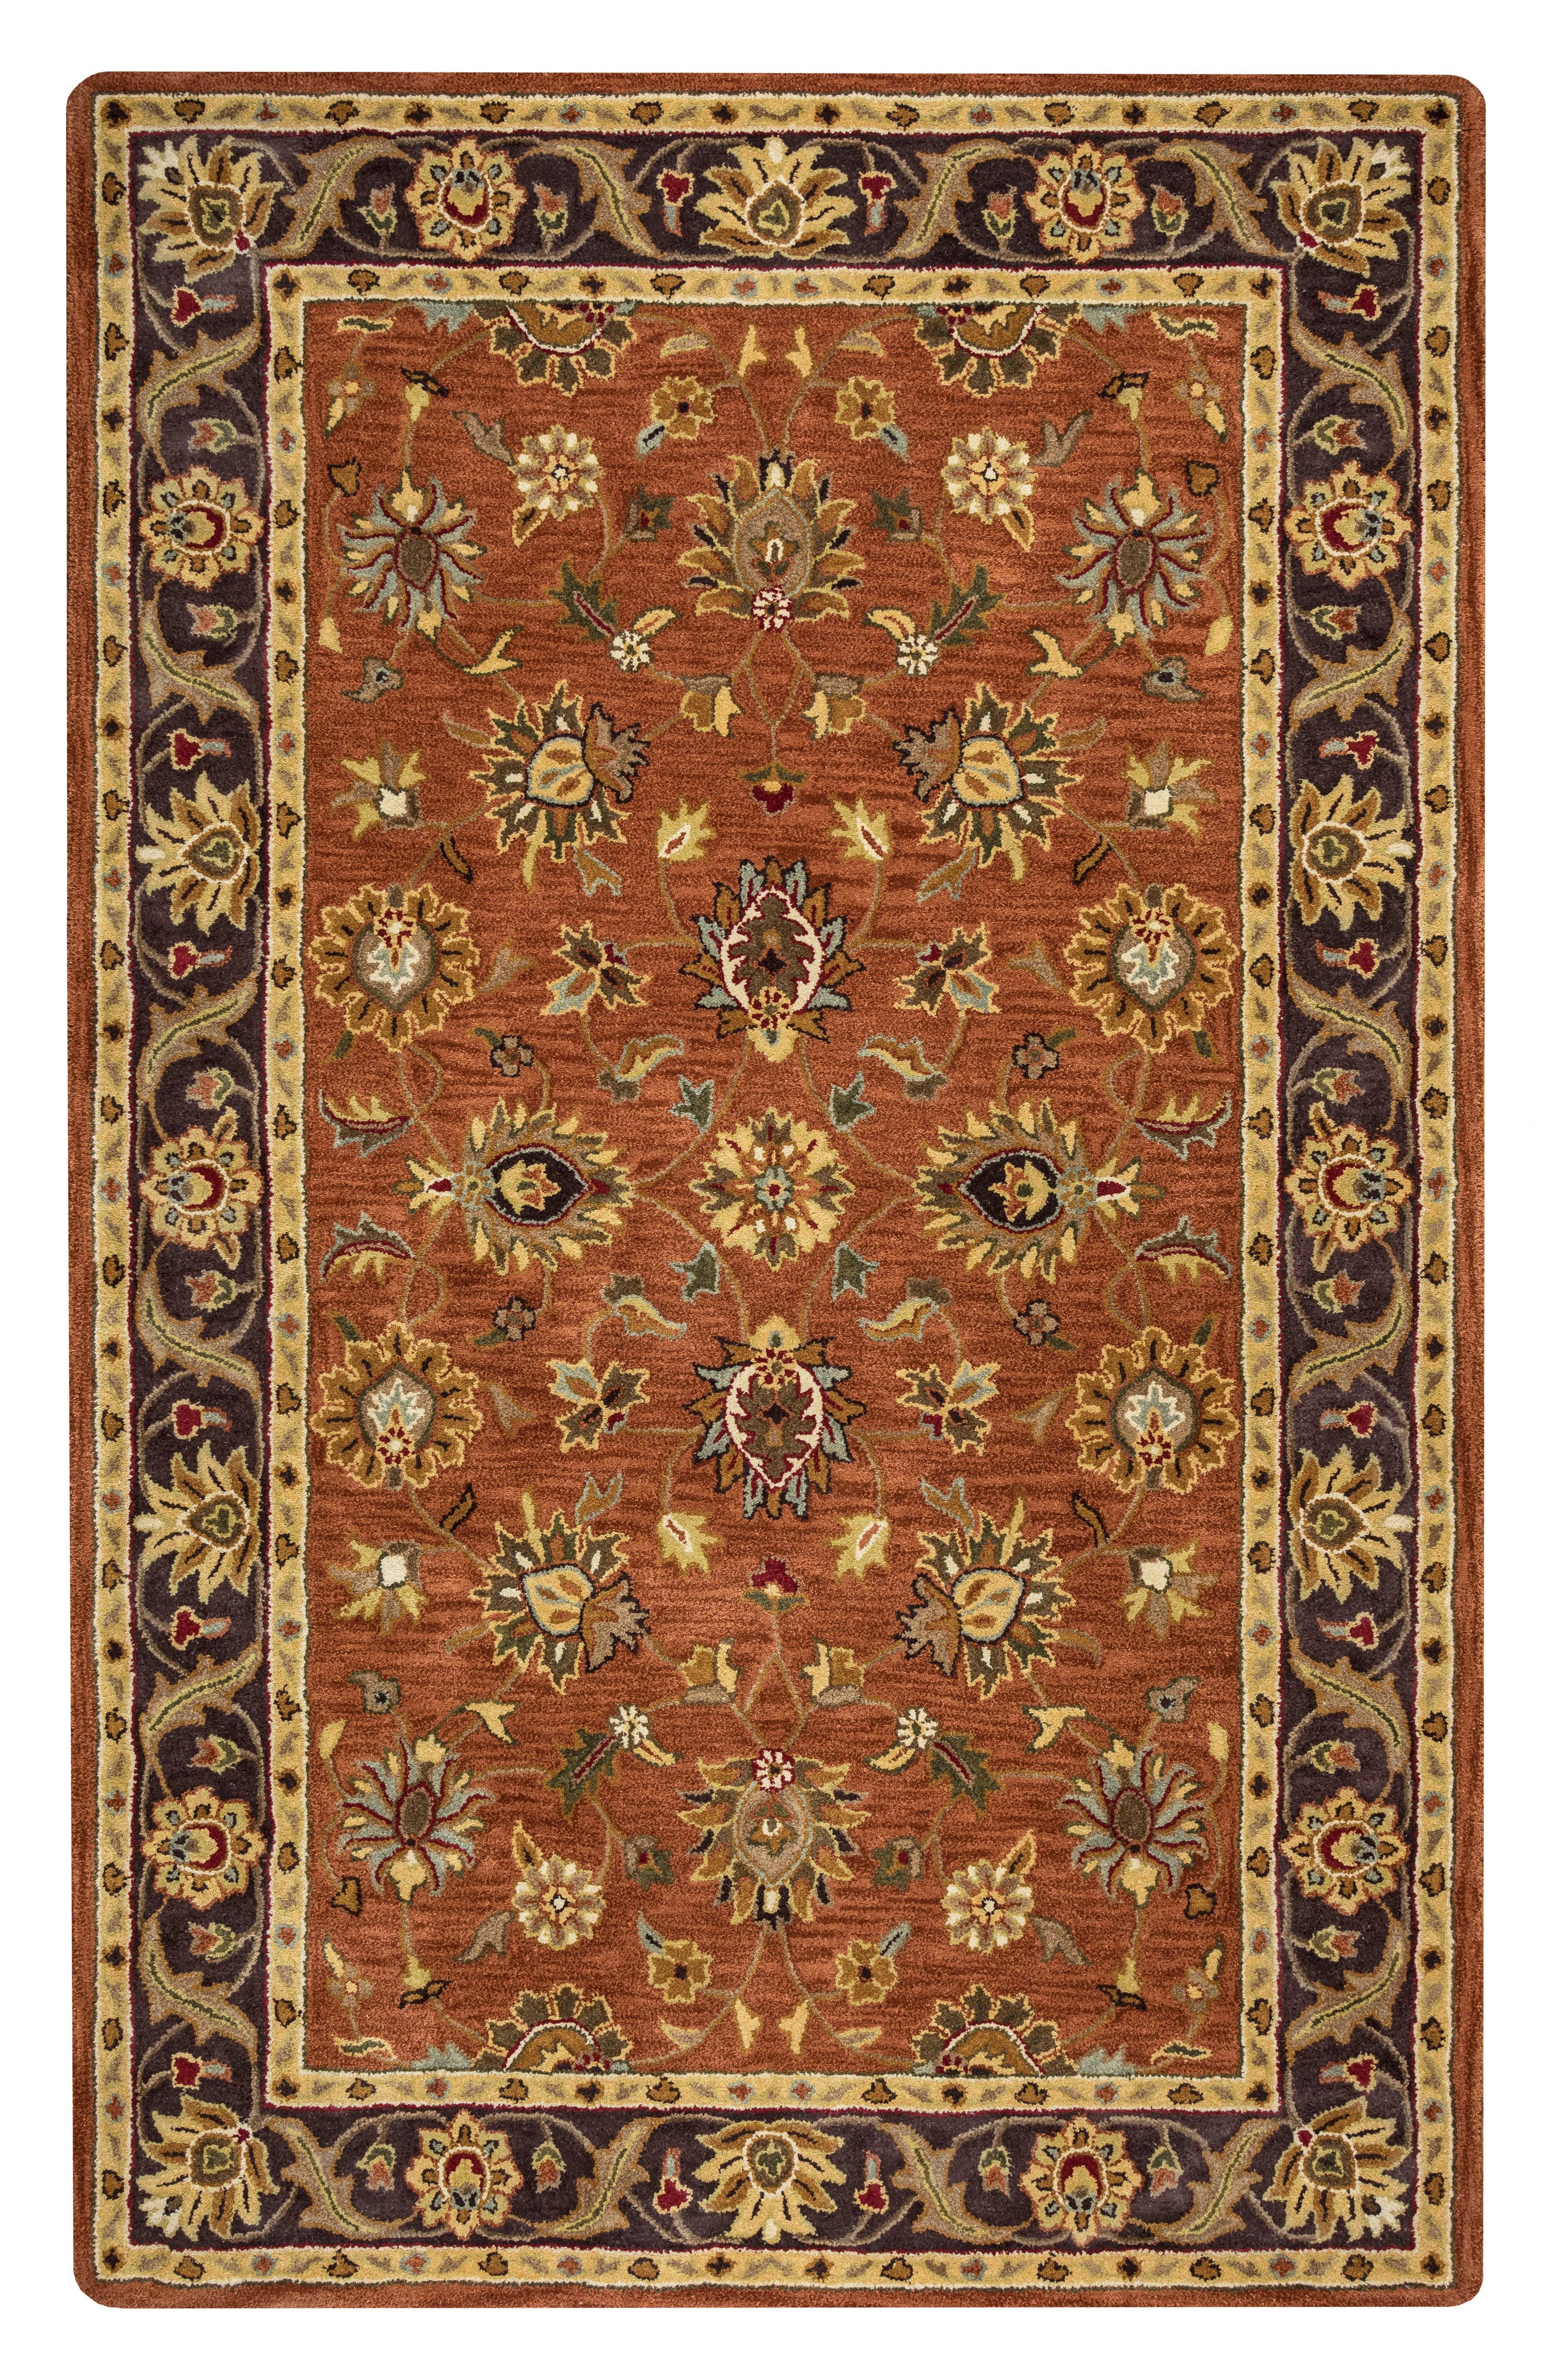 Amalia Hand Tufted Wool Area Rug,                             Main thumbnail 1, color,                             Rust/ Multi